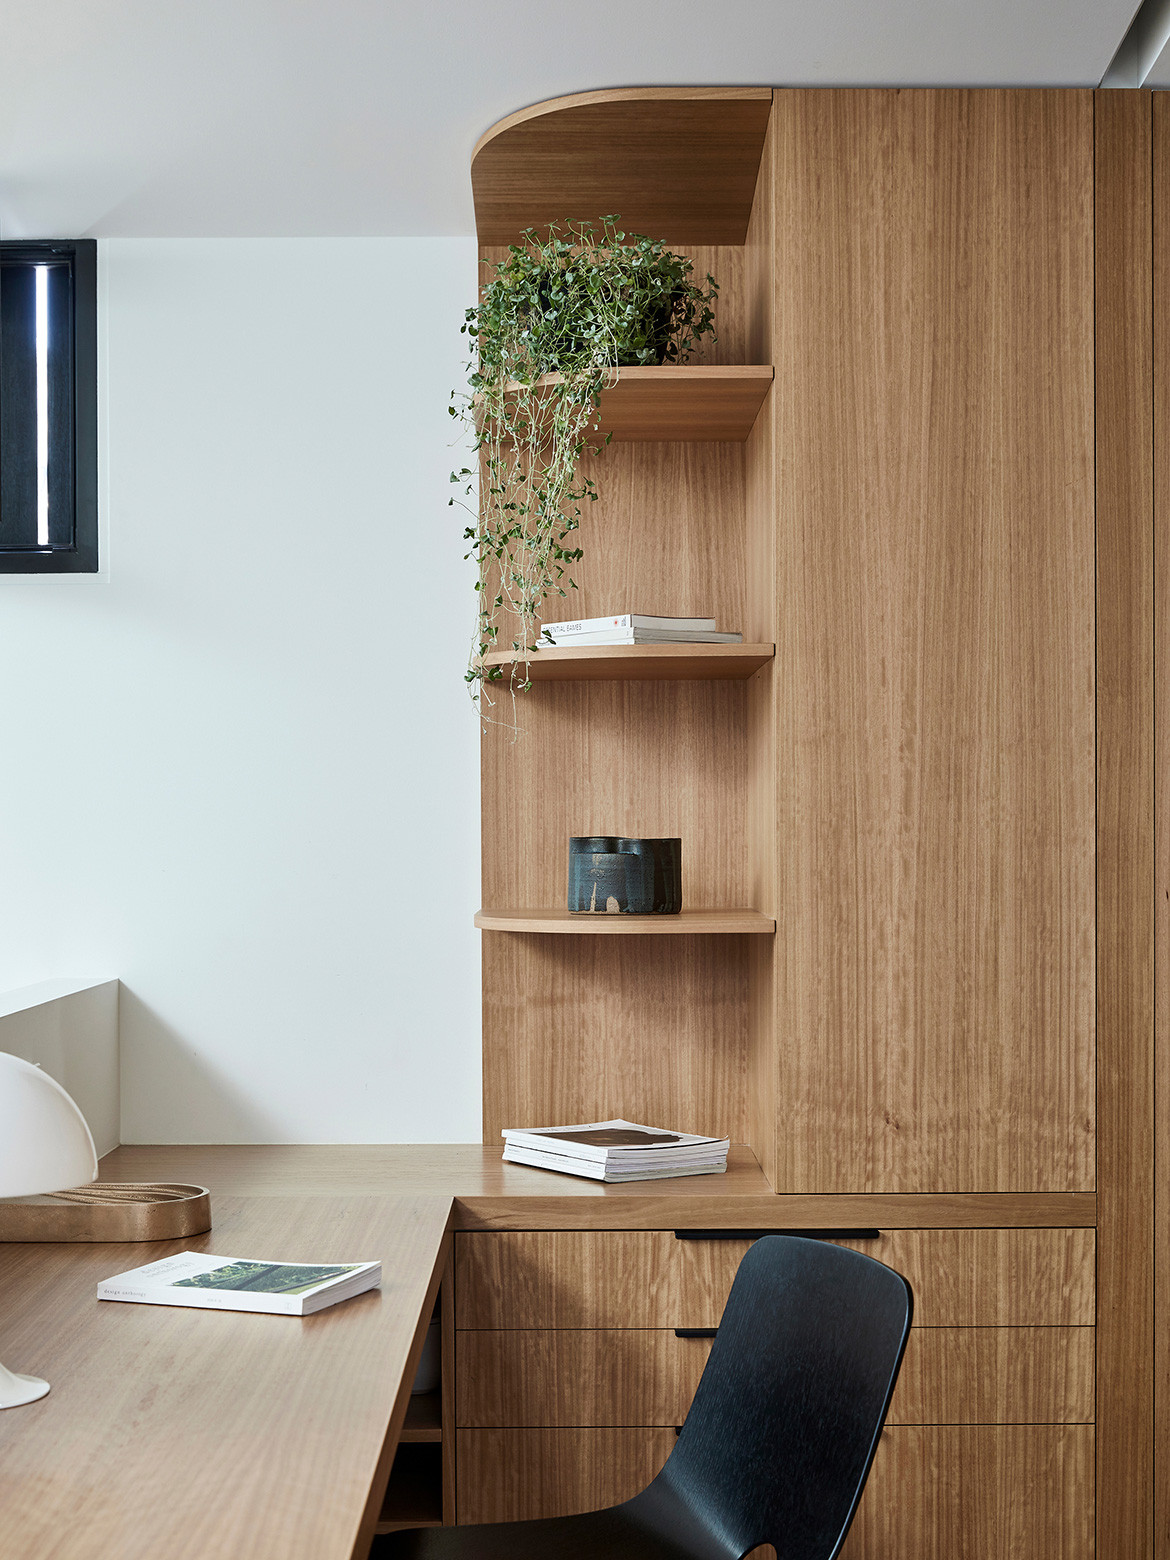 The Ridgeway House Ha cc Derek Swalwell study